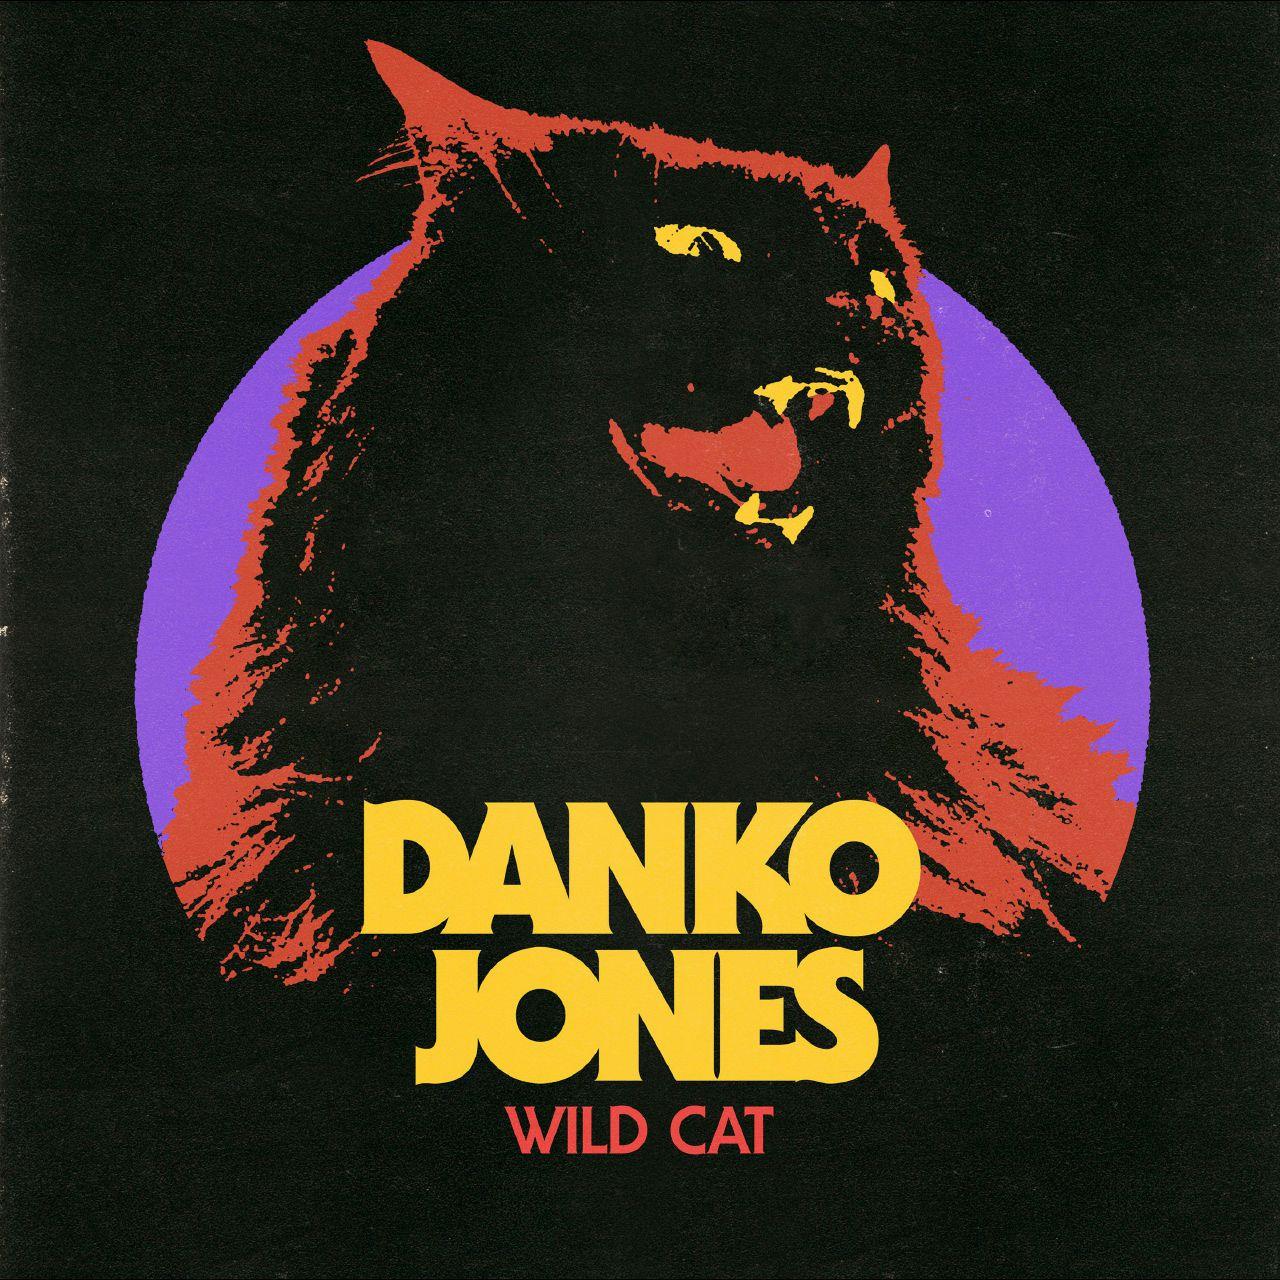 Danko Jones, riff granitici e tanta, tanta adrenalina